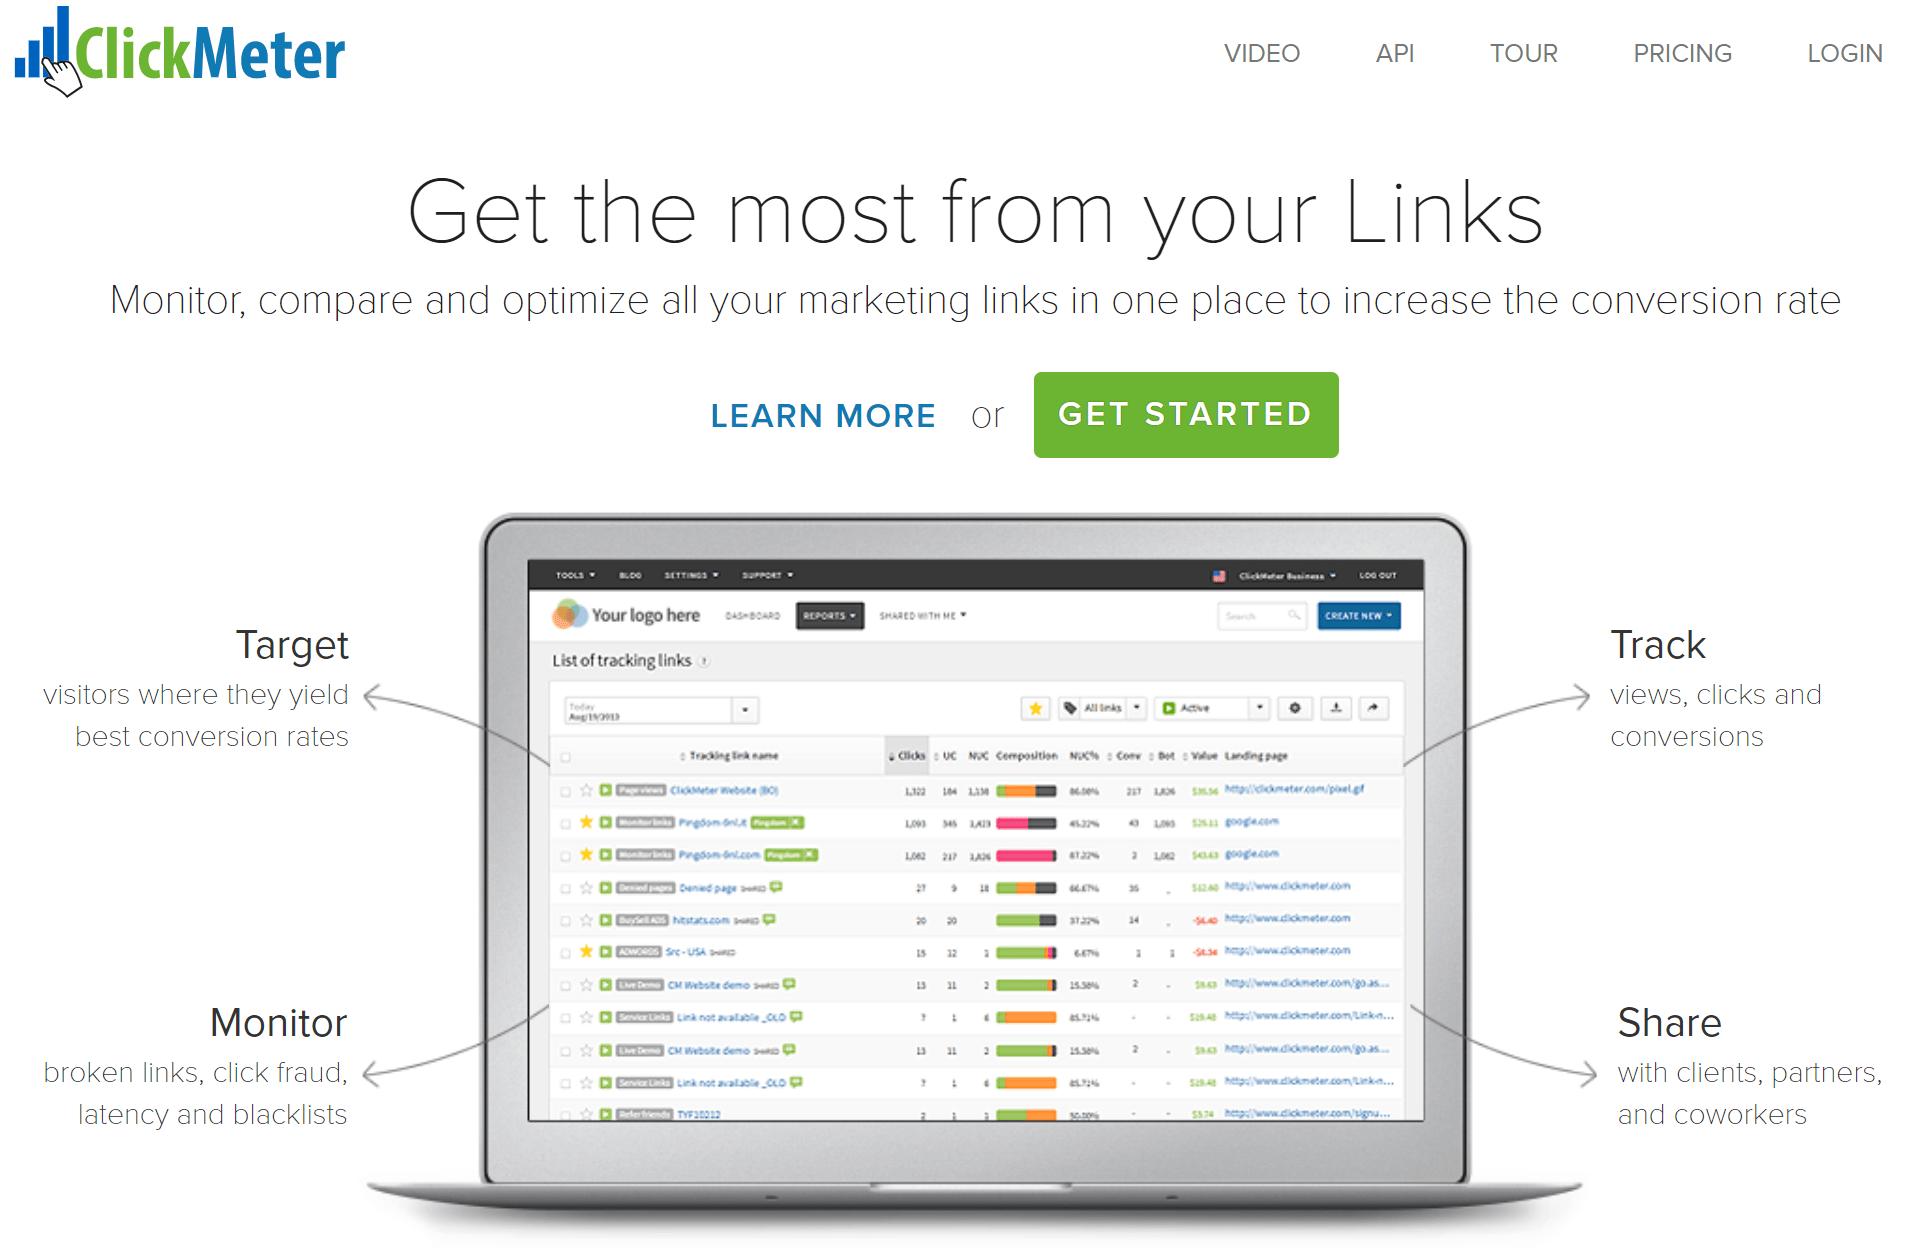 ClickMeter URL Shortener Home Page